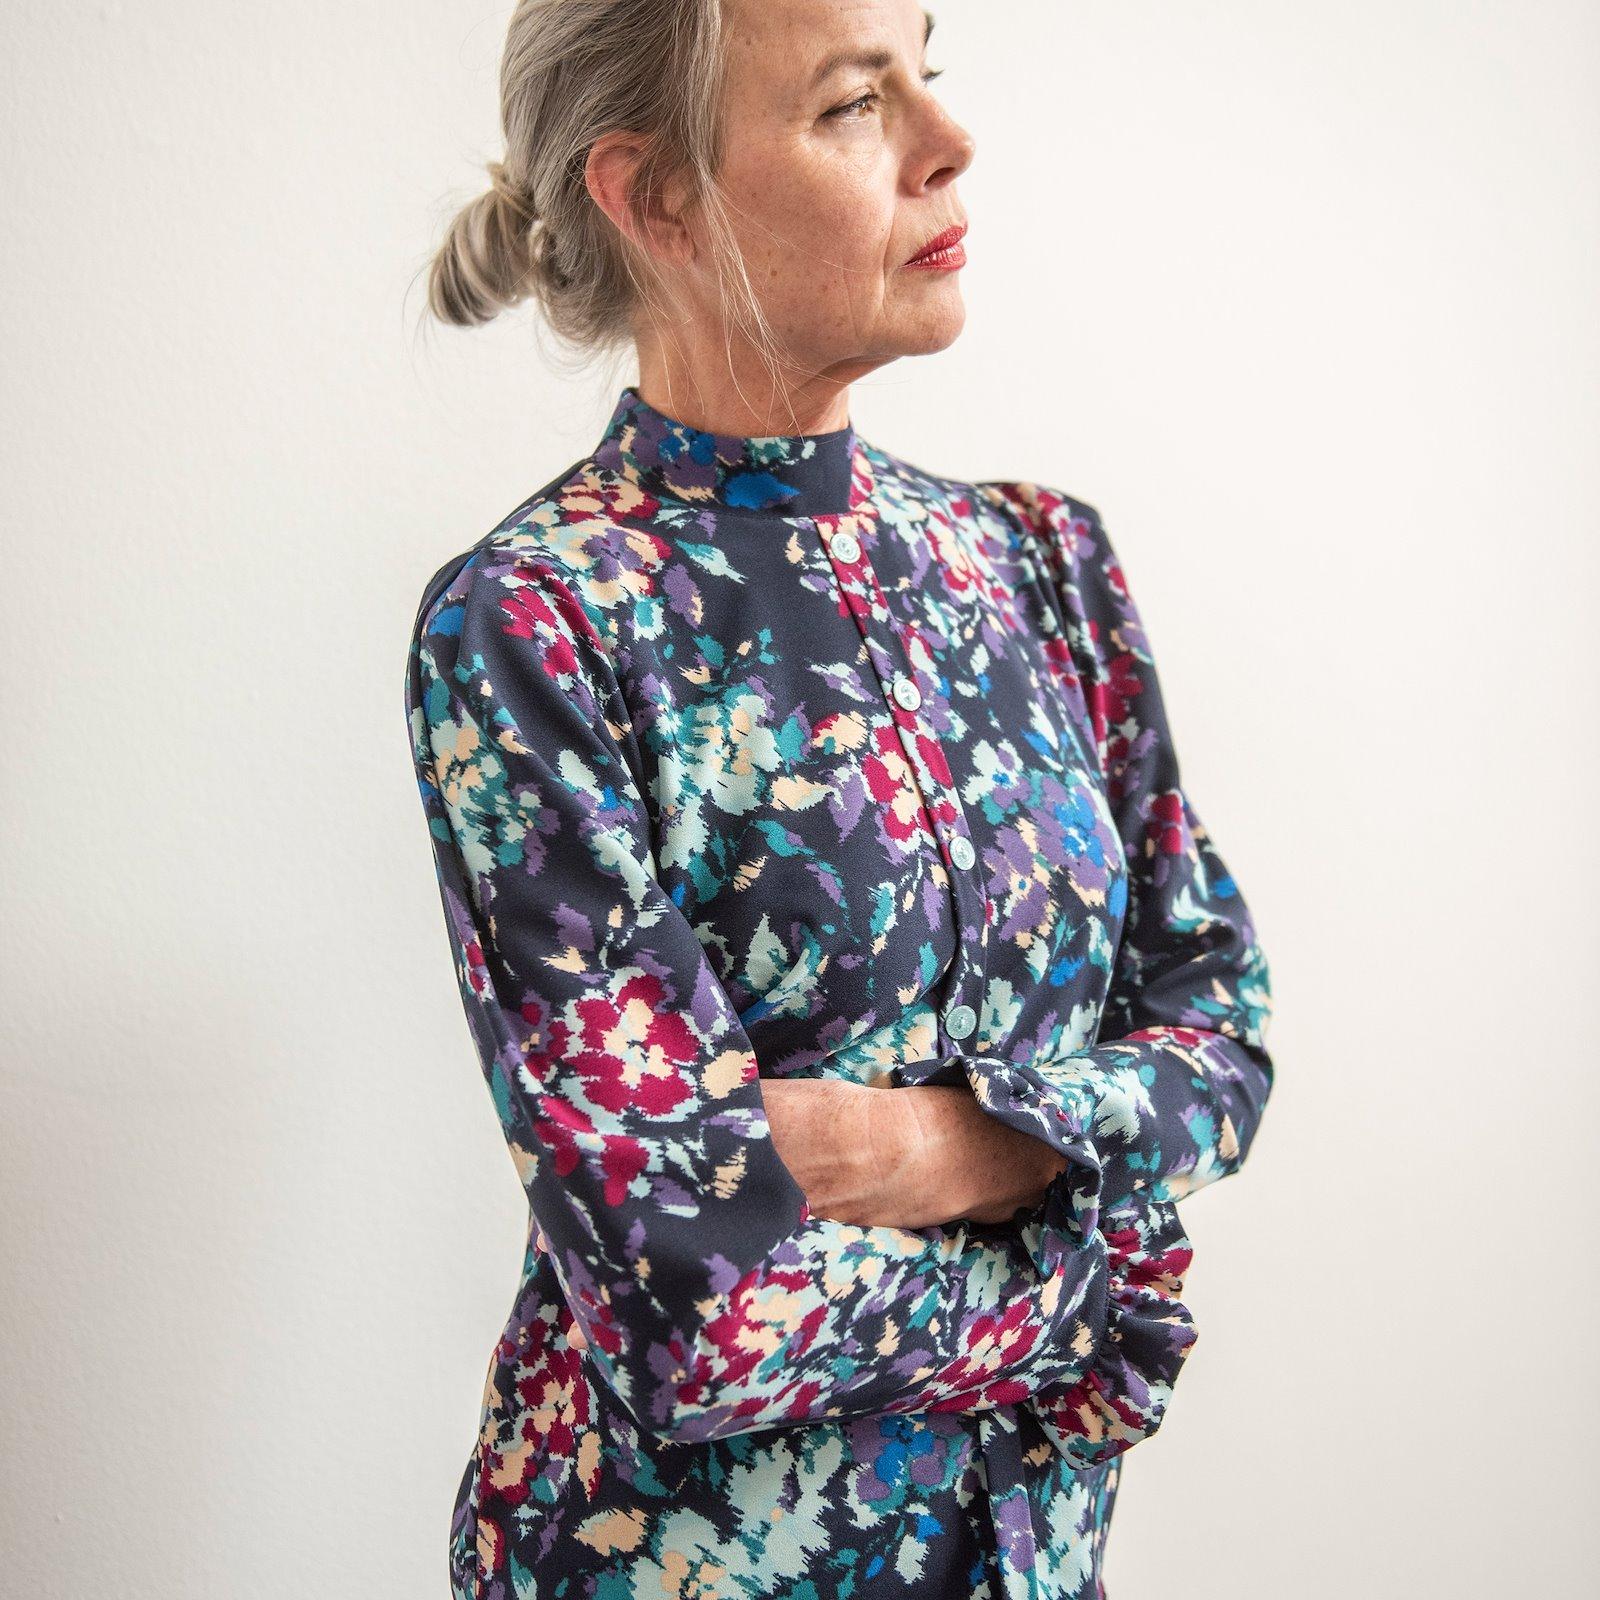 Design your own blouse, 46/18 p22075_560266_sskit